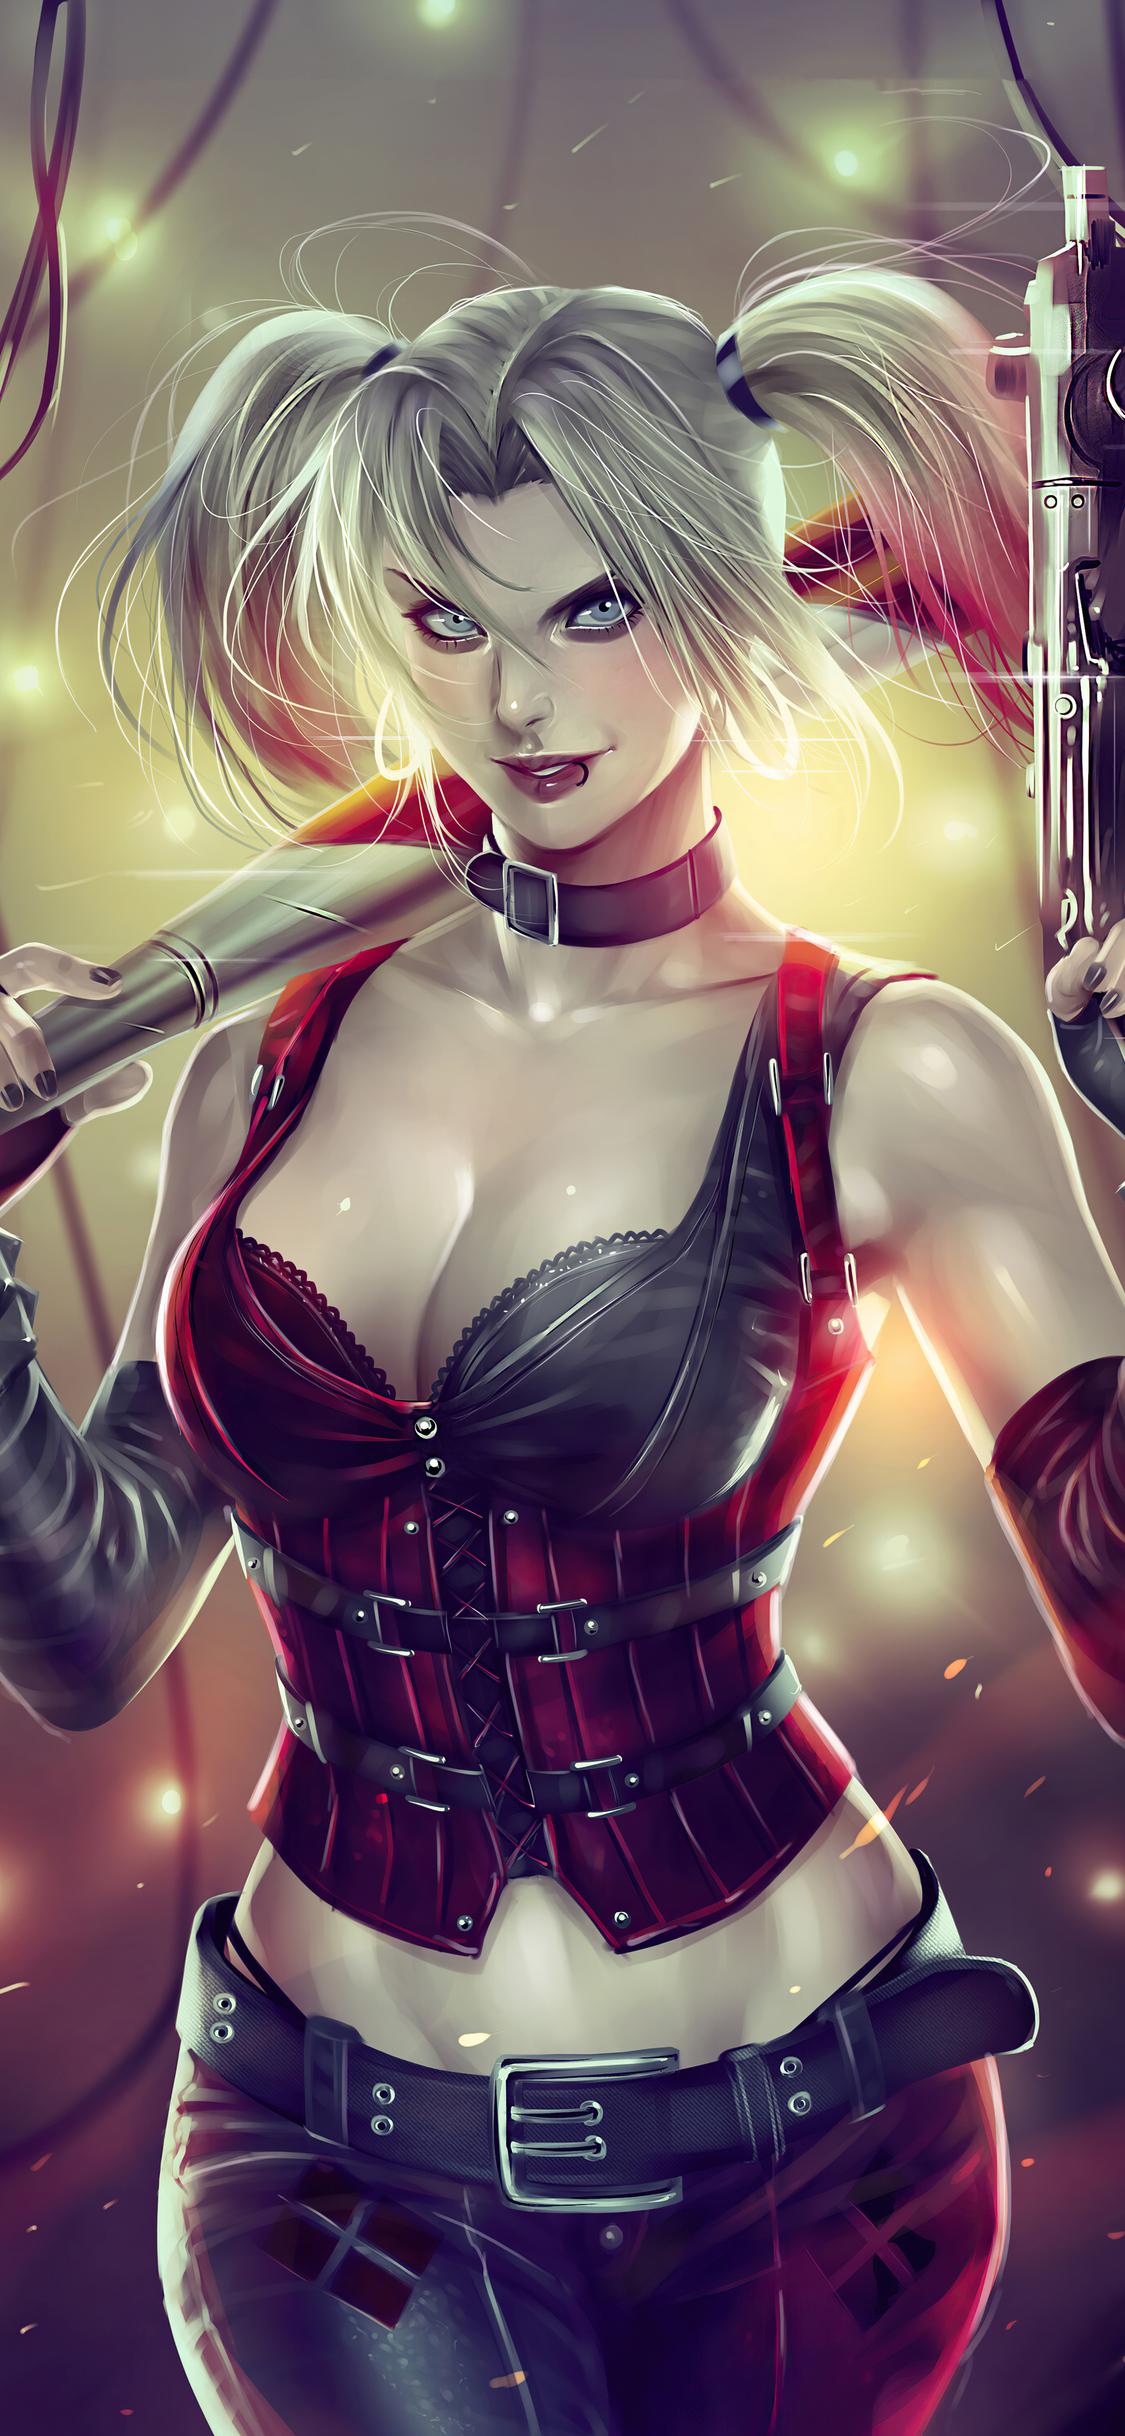 1125x2436 Harley Quinn 2020 4k Iphone XS,Iphone 10,Iphone ...